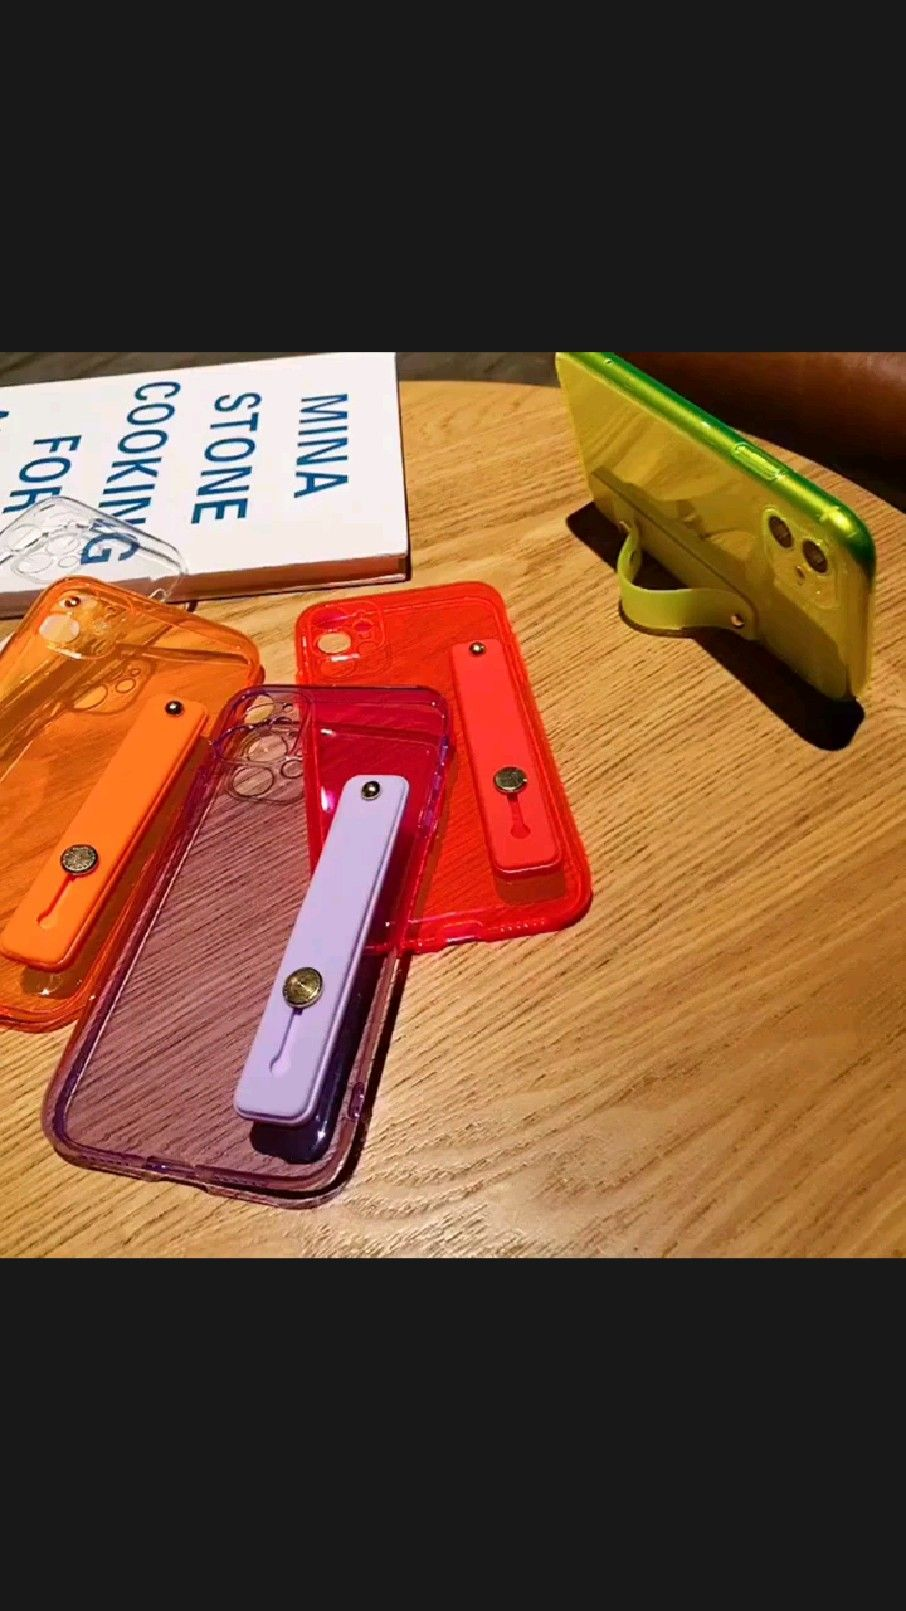 Wrist Band iPhone Case